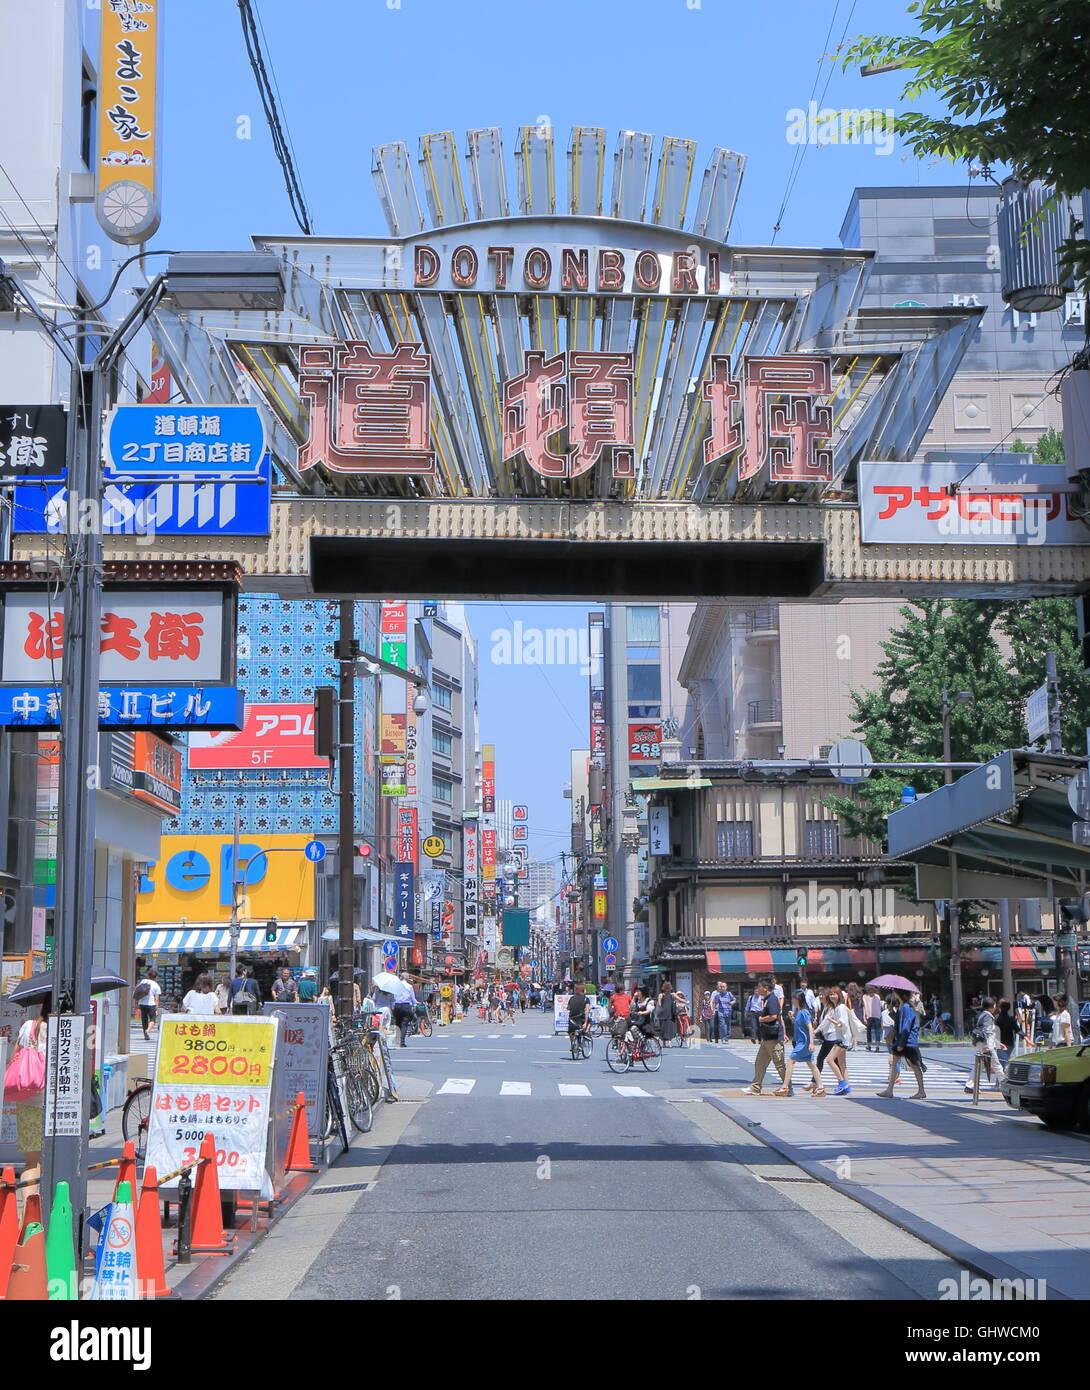 Distrito de Entretenimiento de Dotonbori en Osaka, Japón. Imagen De Stock